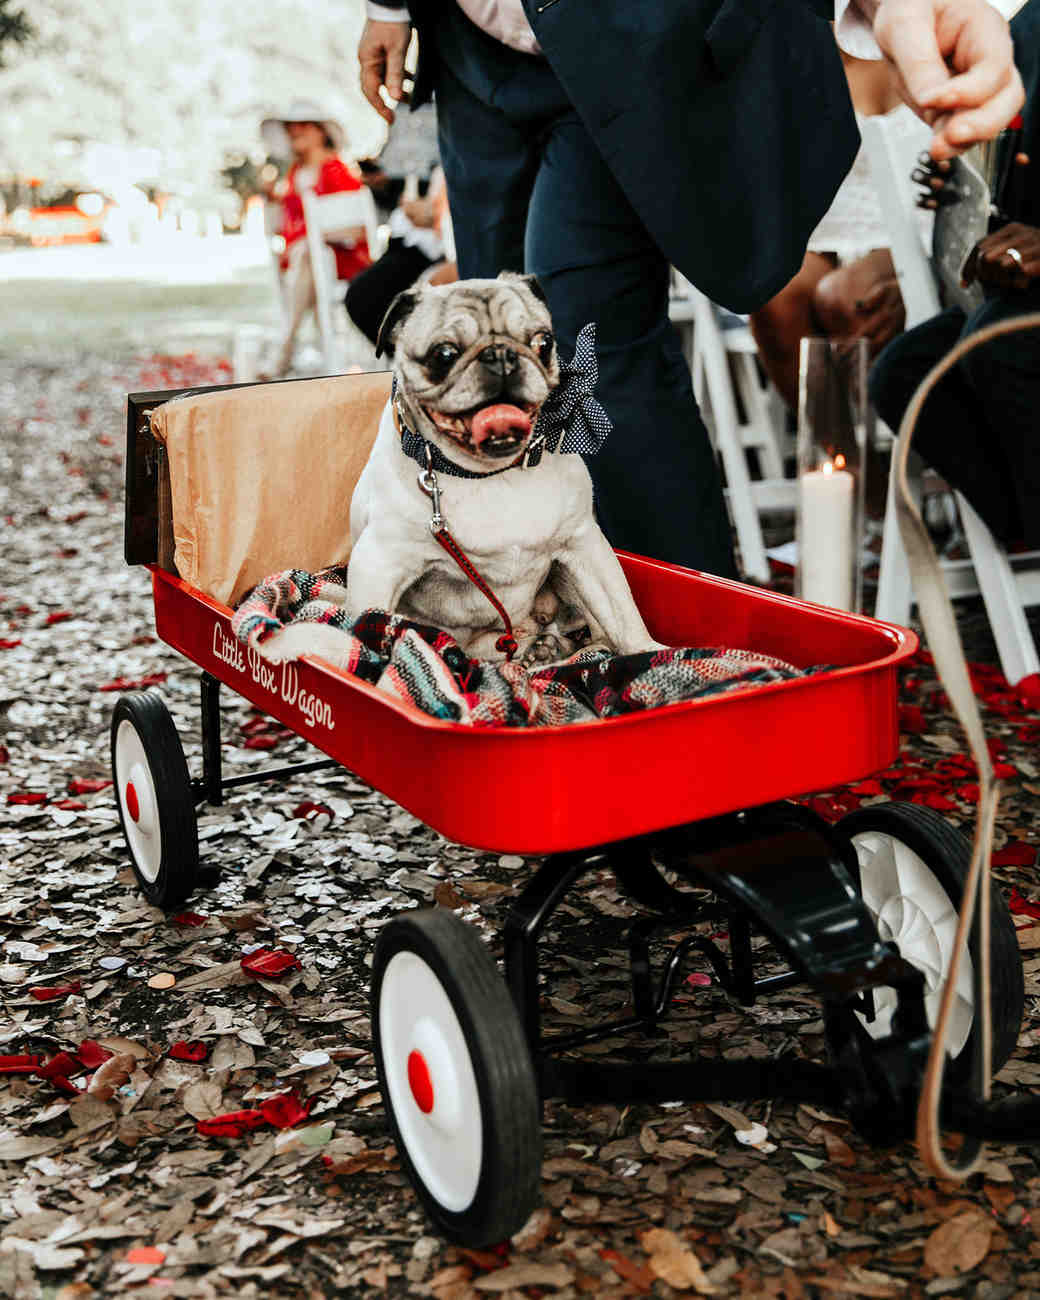 joe-tim-wedding-dog-wagon-0808-1018_vert.jpg